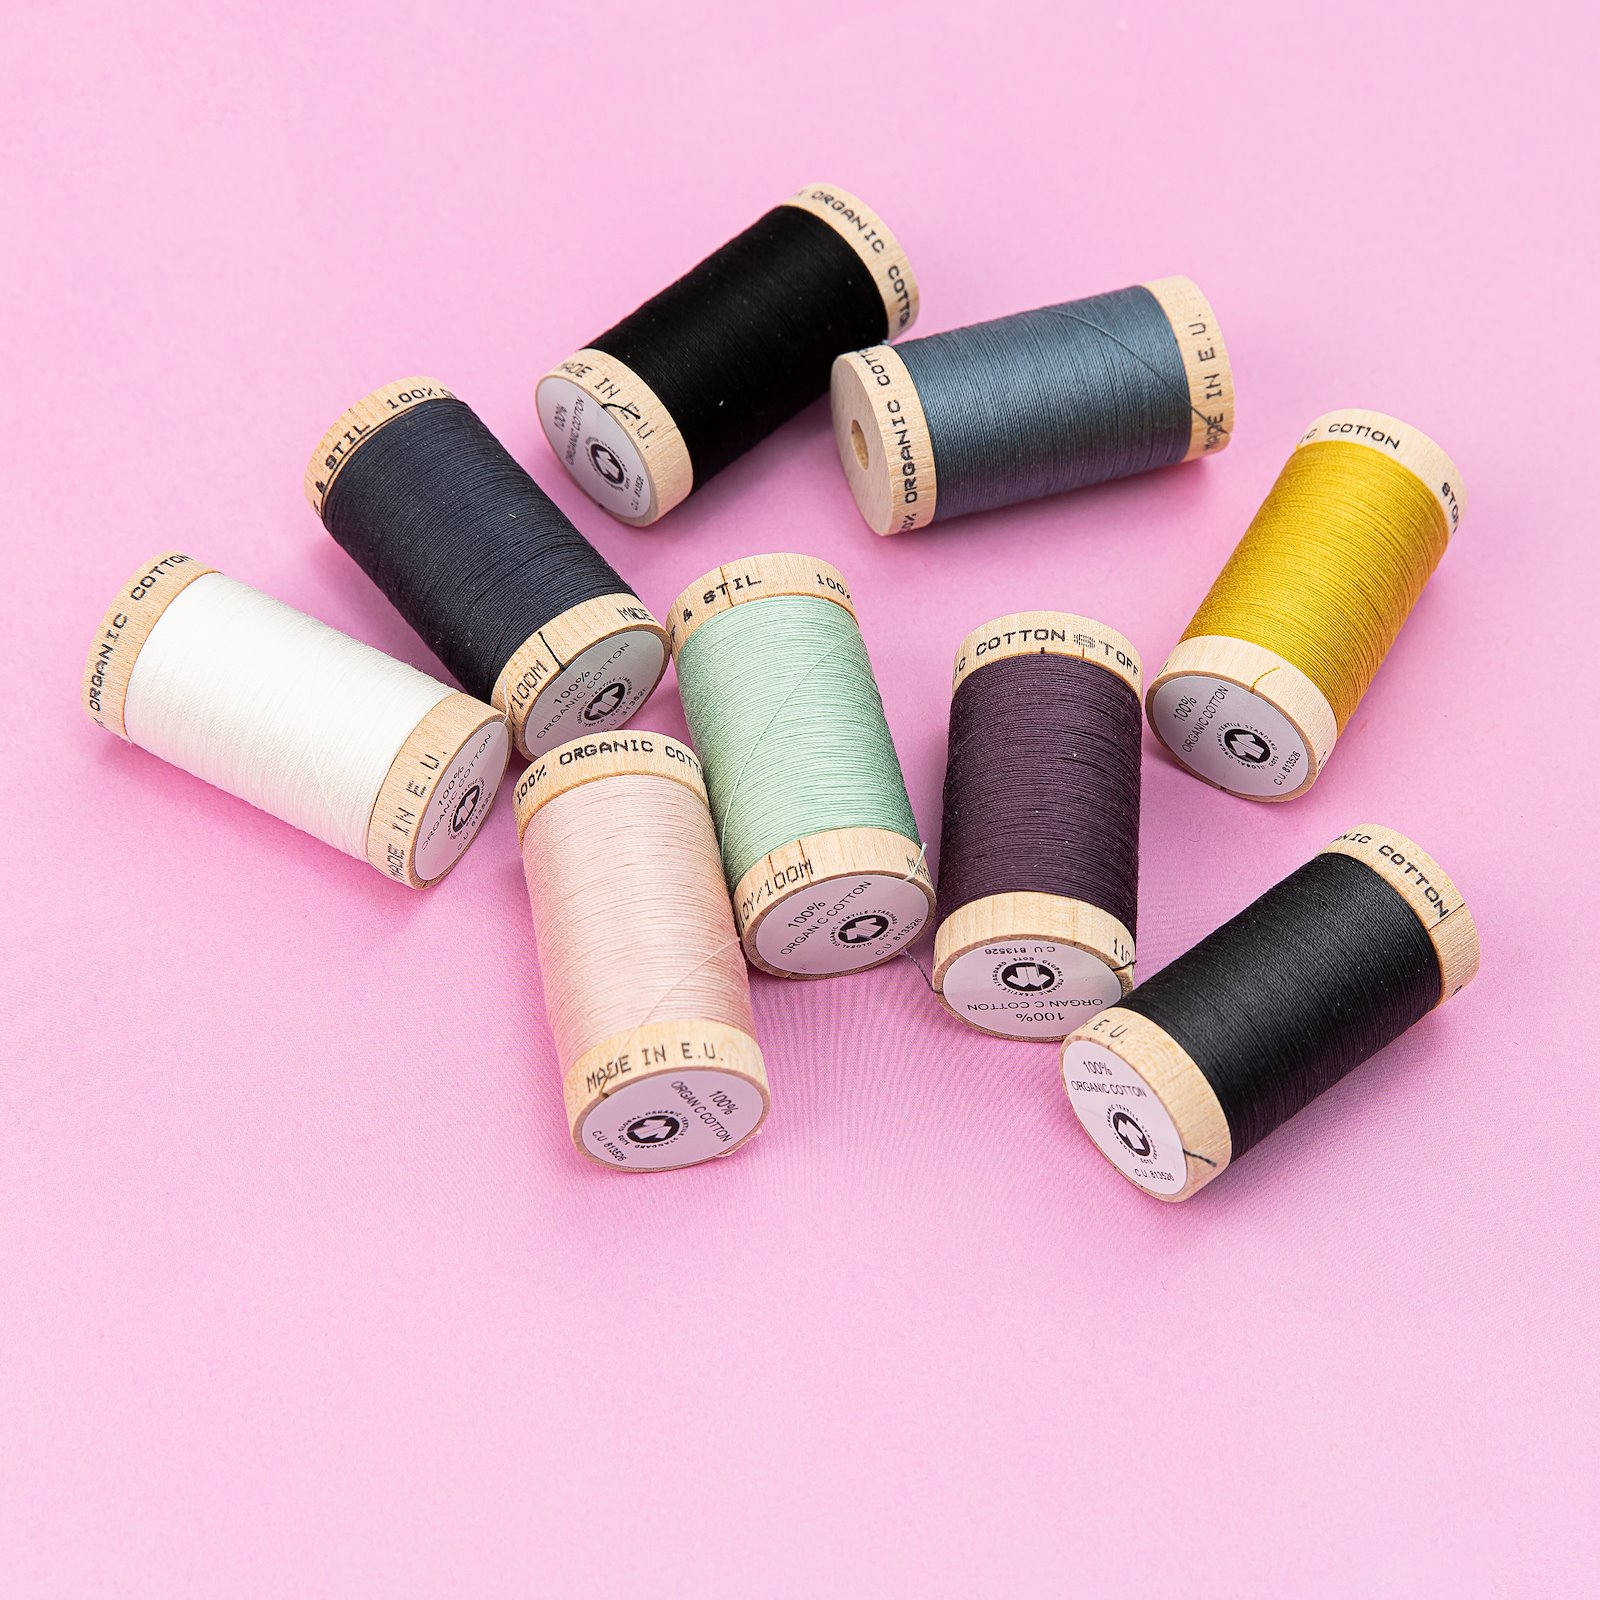 Sewing thread organic cotton blue 100m 18092_18033_18042_18072_18017_18043_18023_18021_18002_bundle